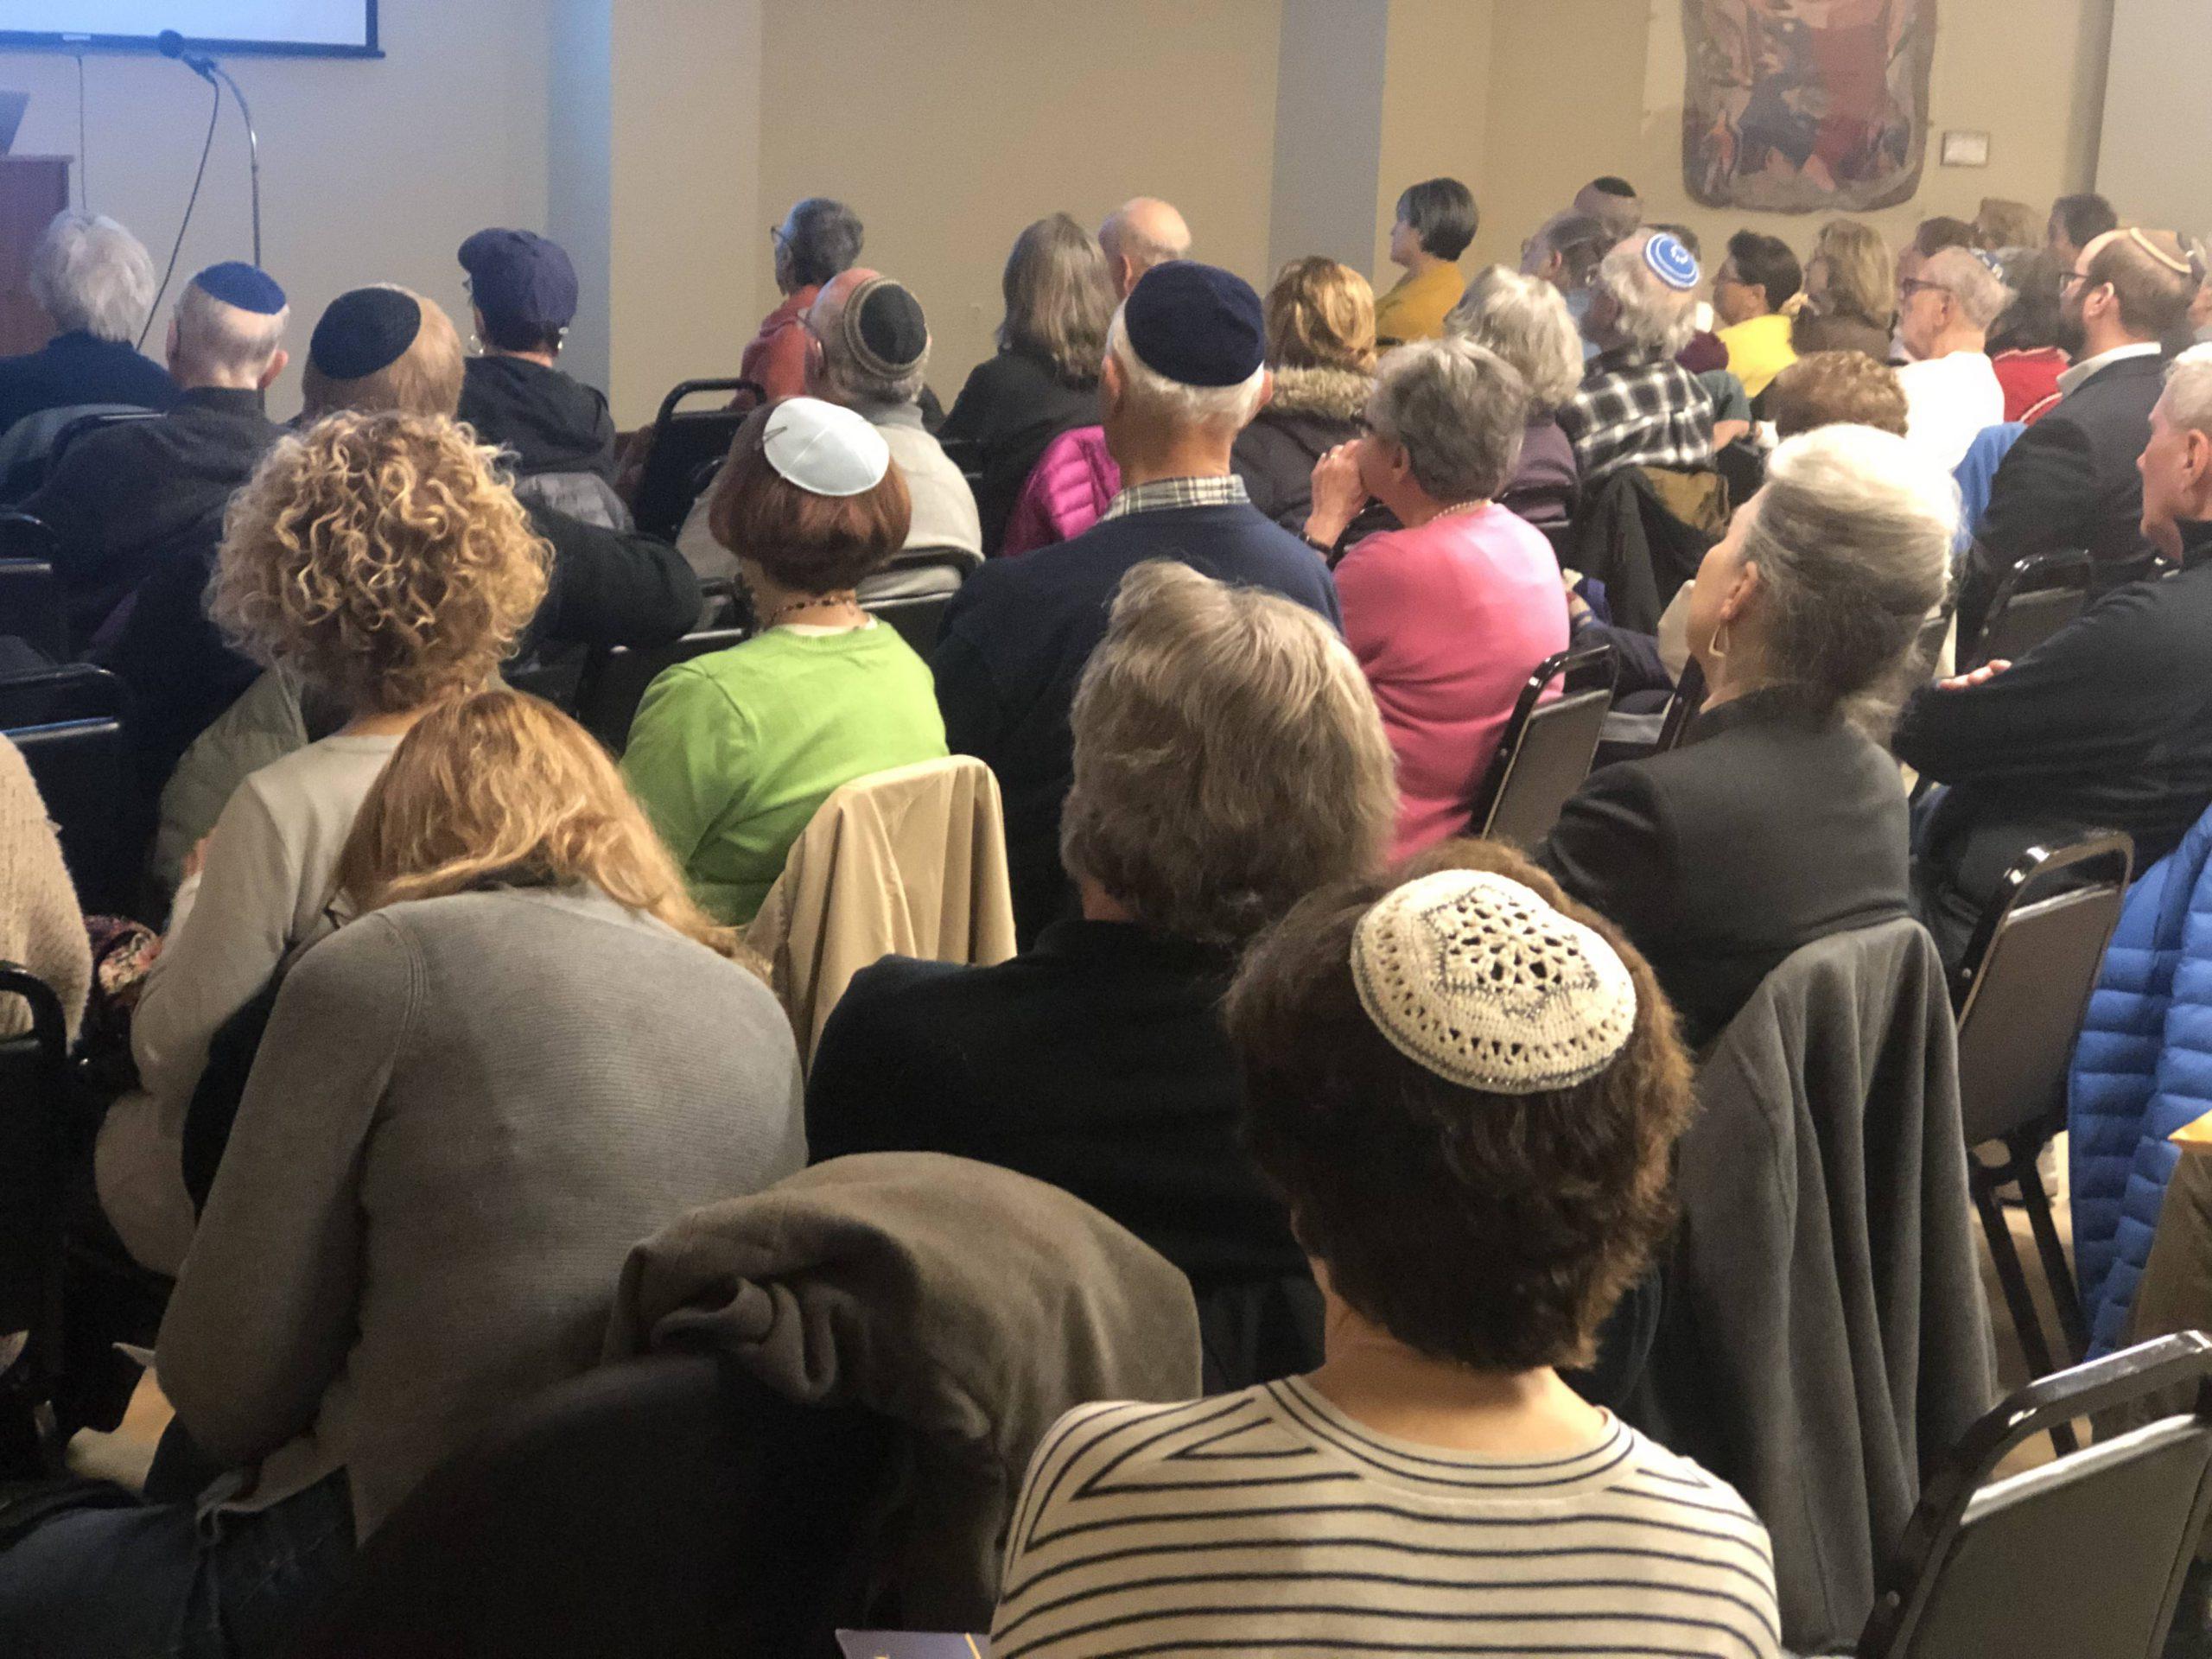 April 11 - Caldwell, NJ - Why Israel